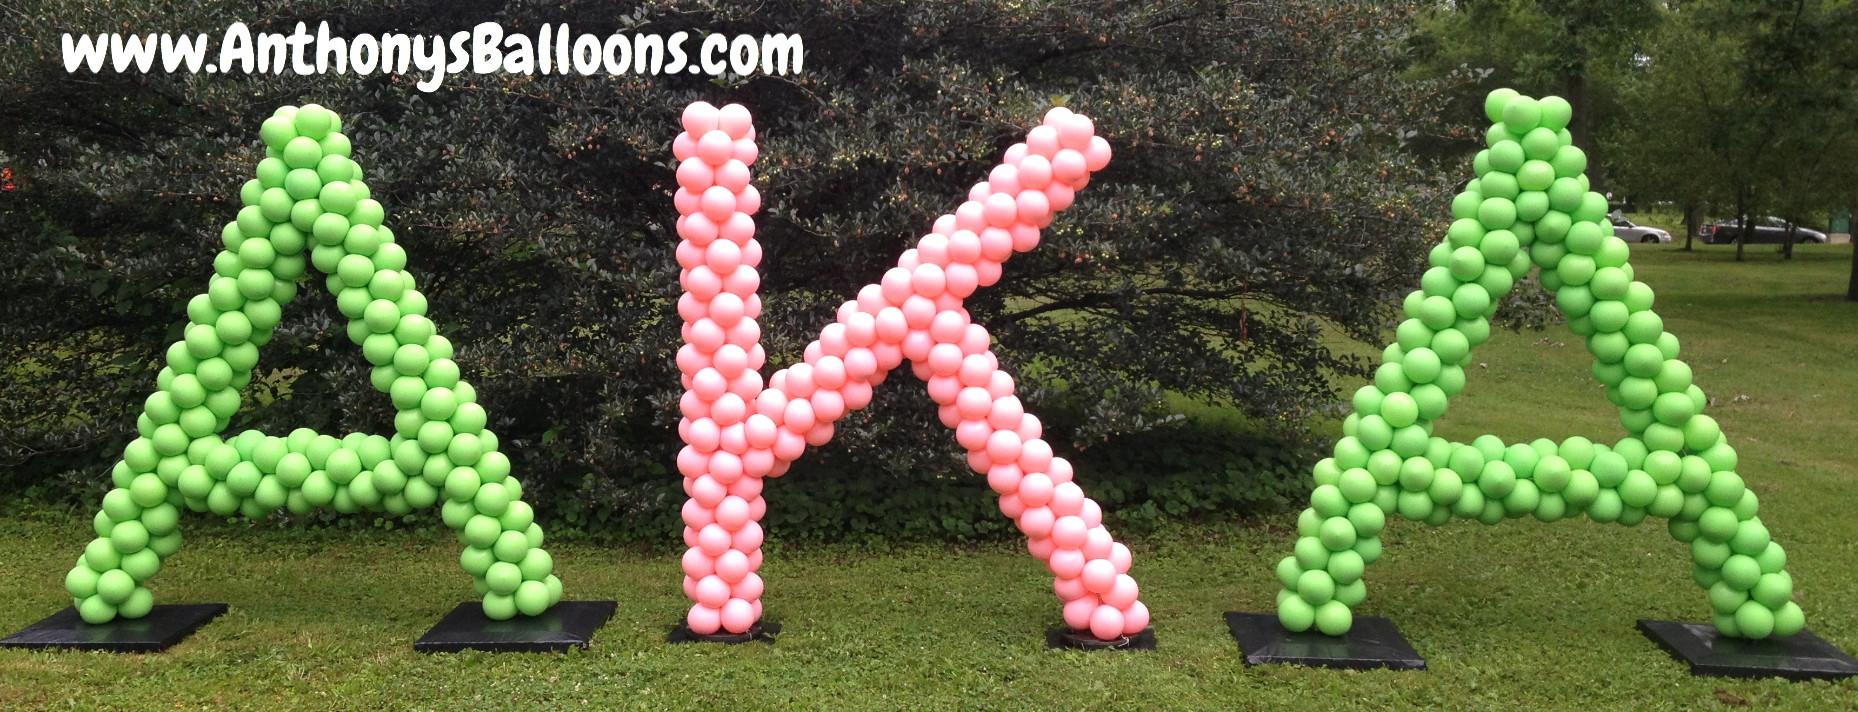 Letter Balloon Sculpture - 6ft